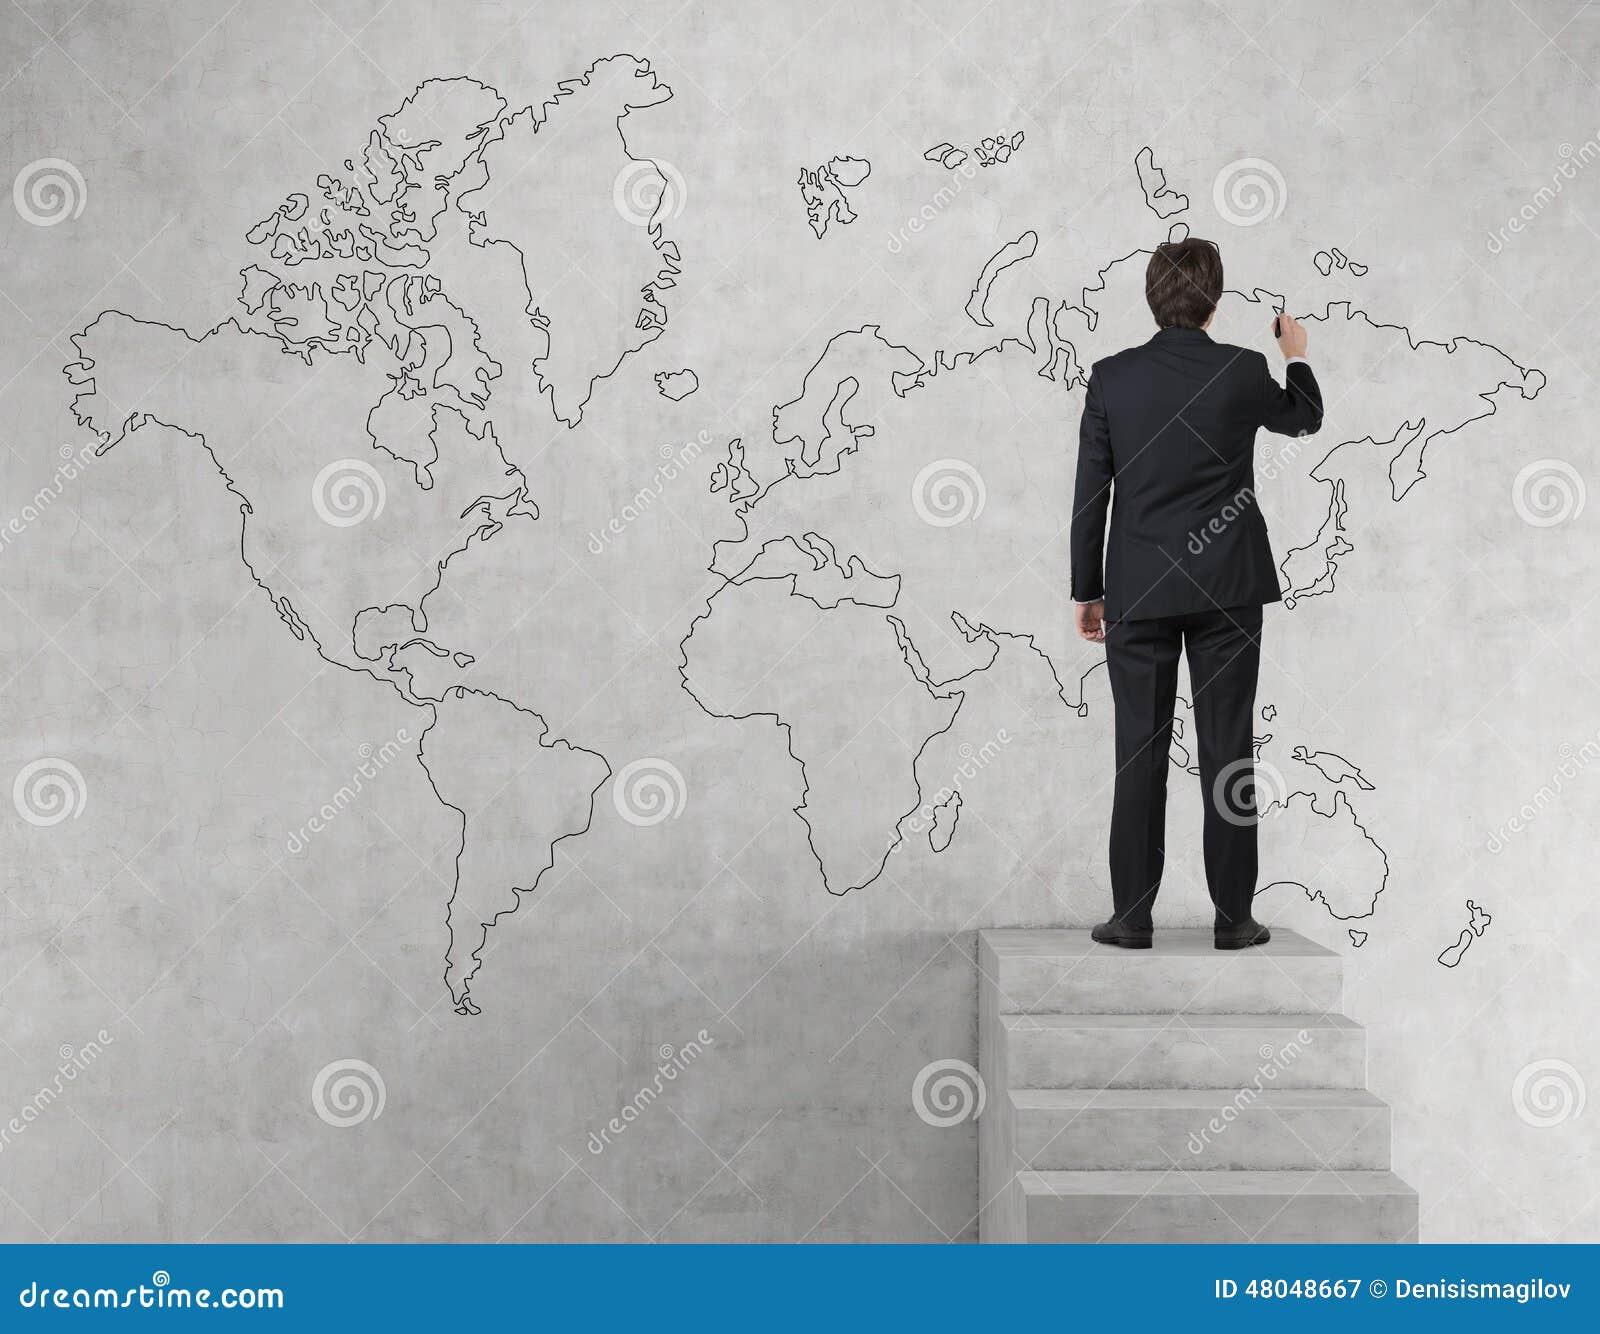 Businessman drawing world map stock image image of creativity businessman drawing world map stock image image of creativity research 48048667 gumiabroncs Choice Image